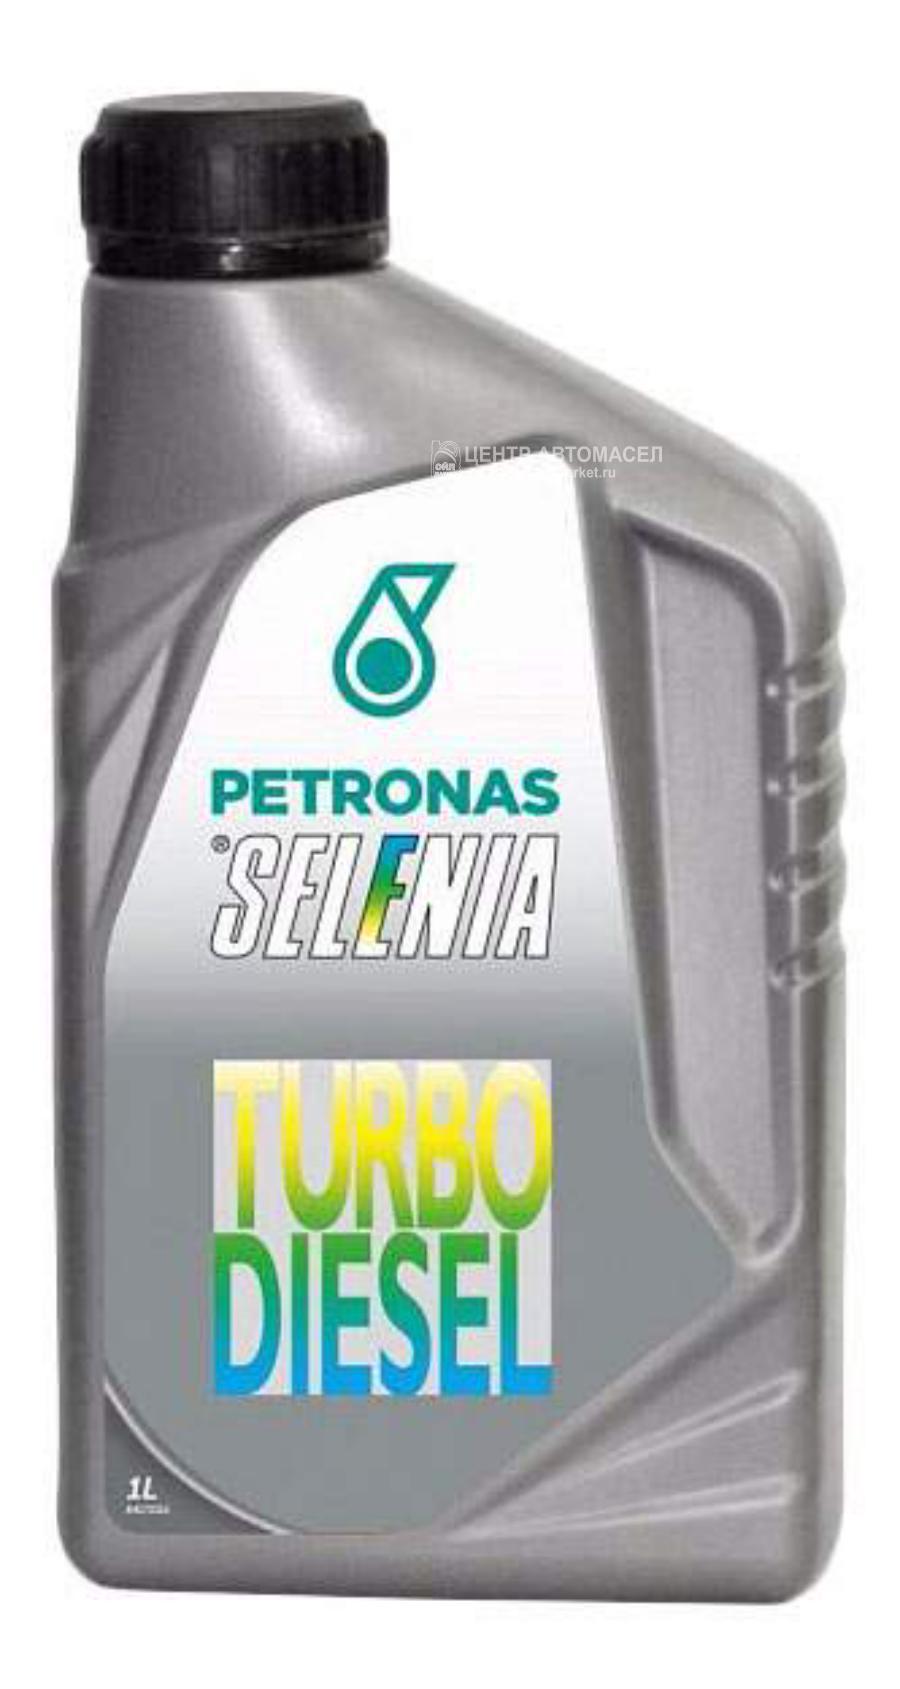 Масло моторное полусинтетическое TURBO DIESEL 10W-40, 1л